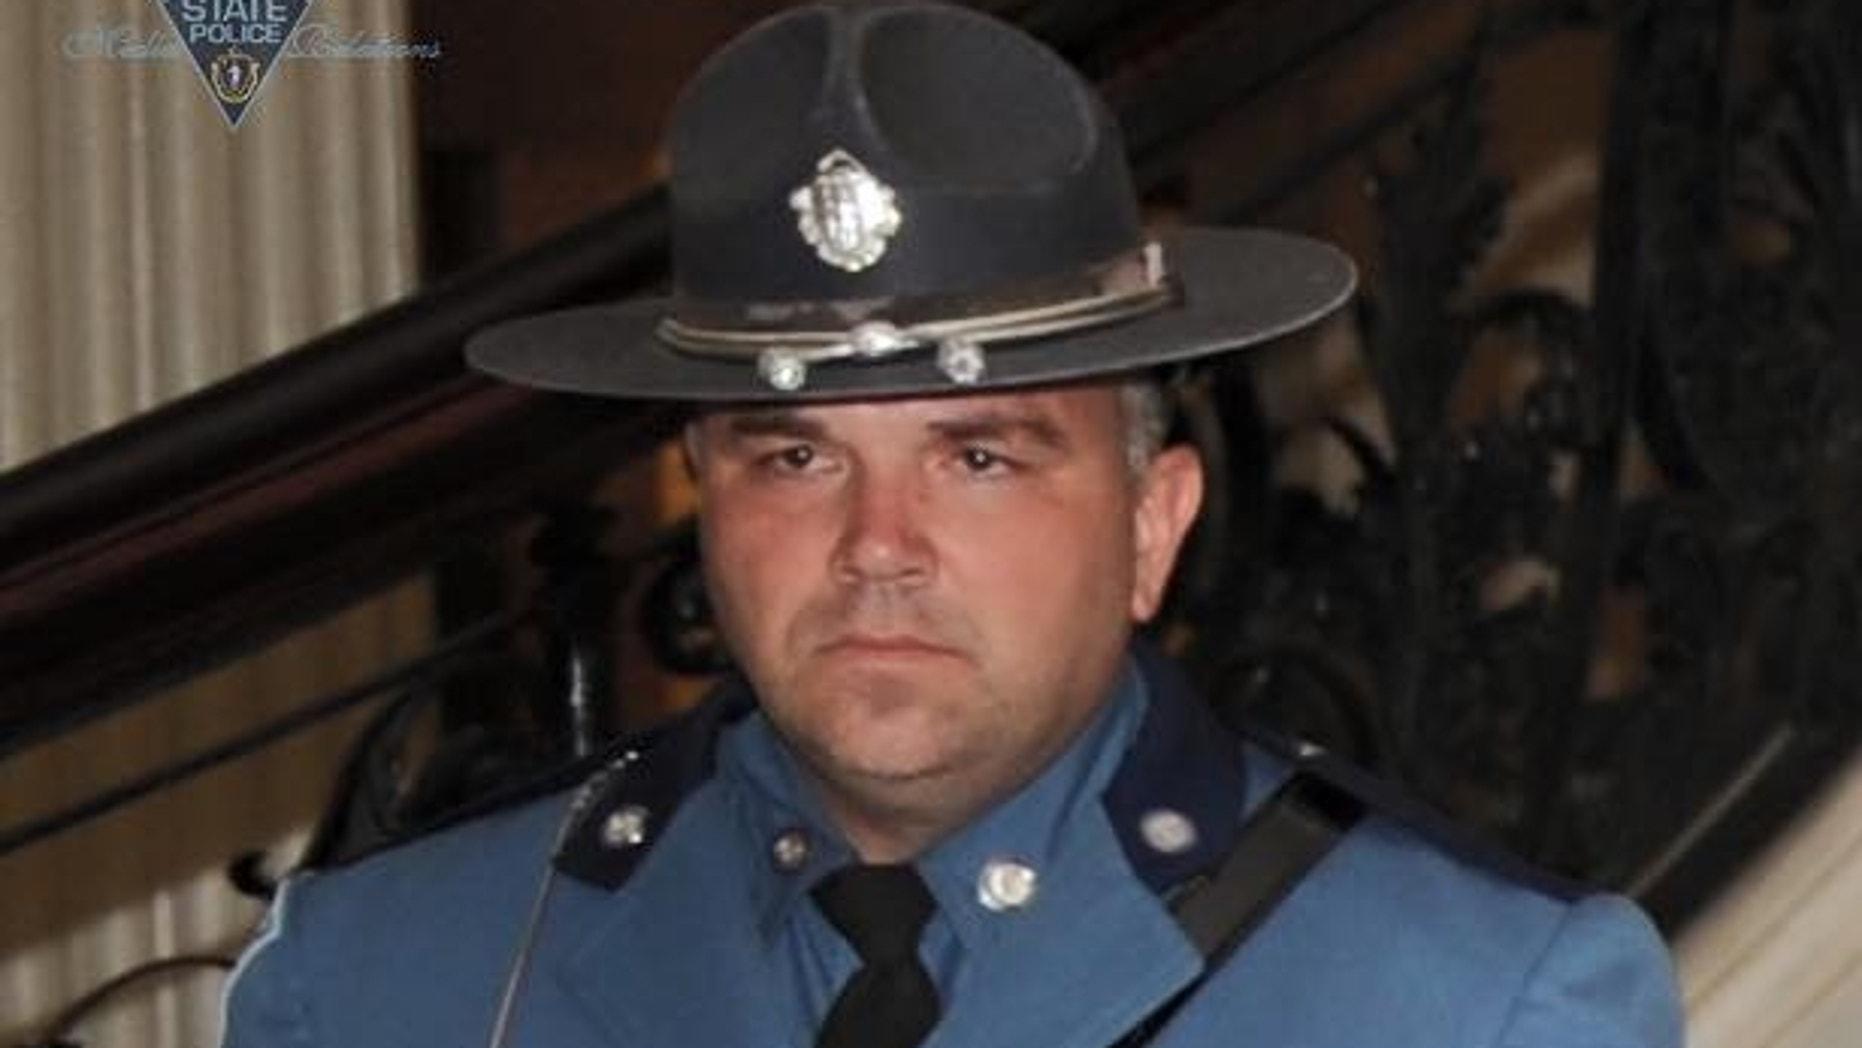 Massachusetts State Police trooper Thomas Clardy.